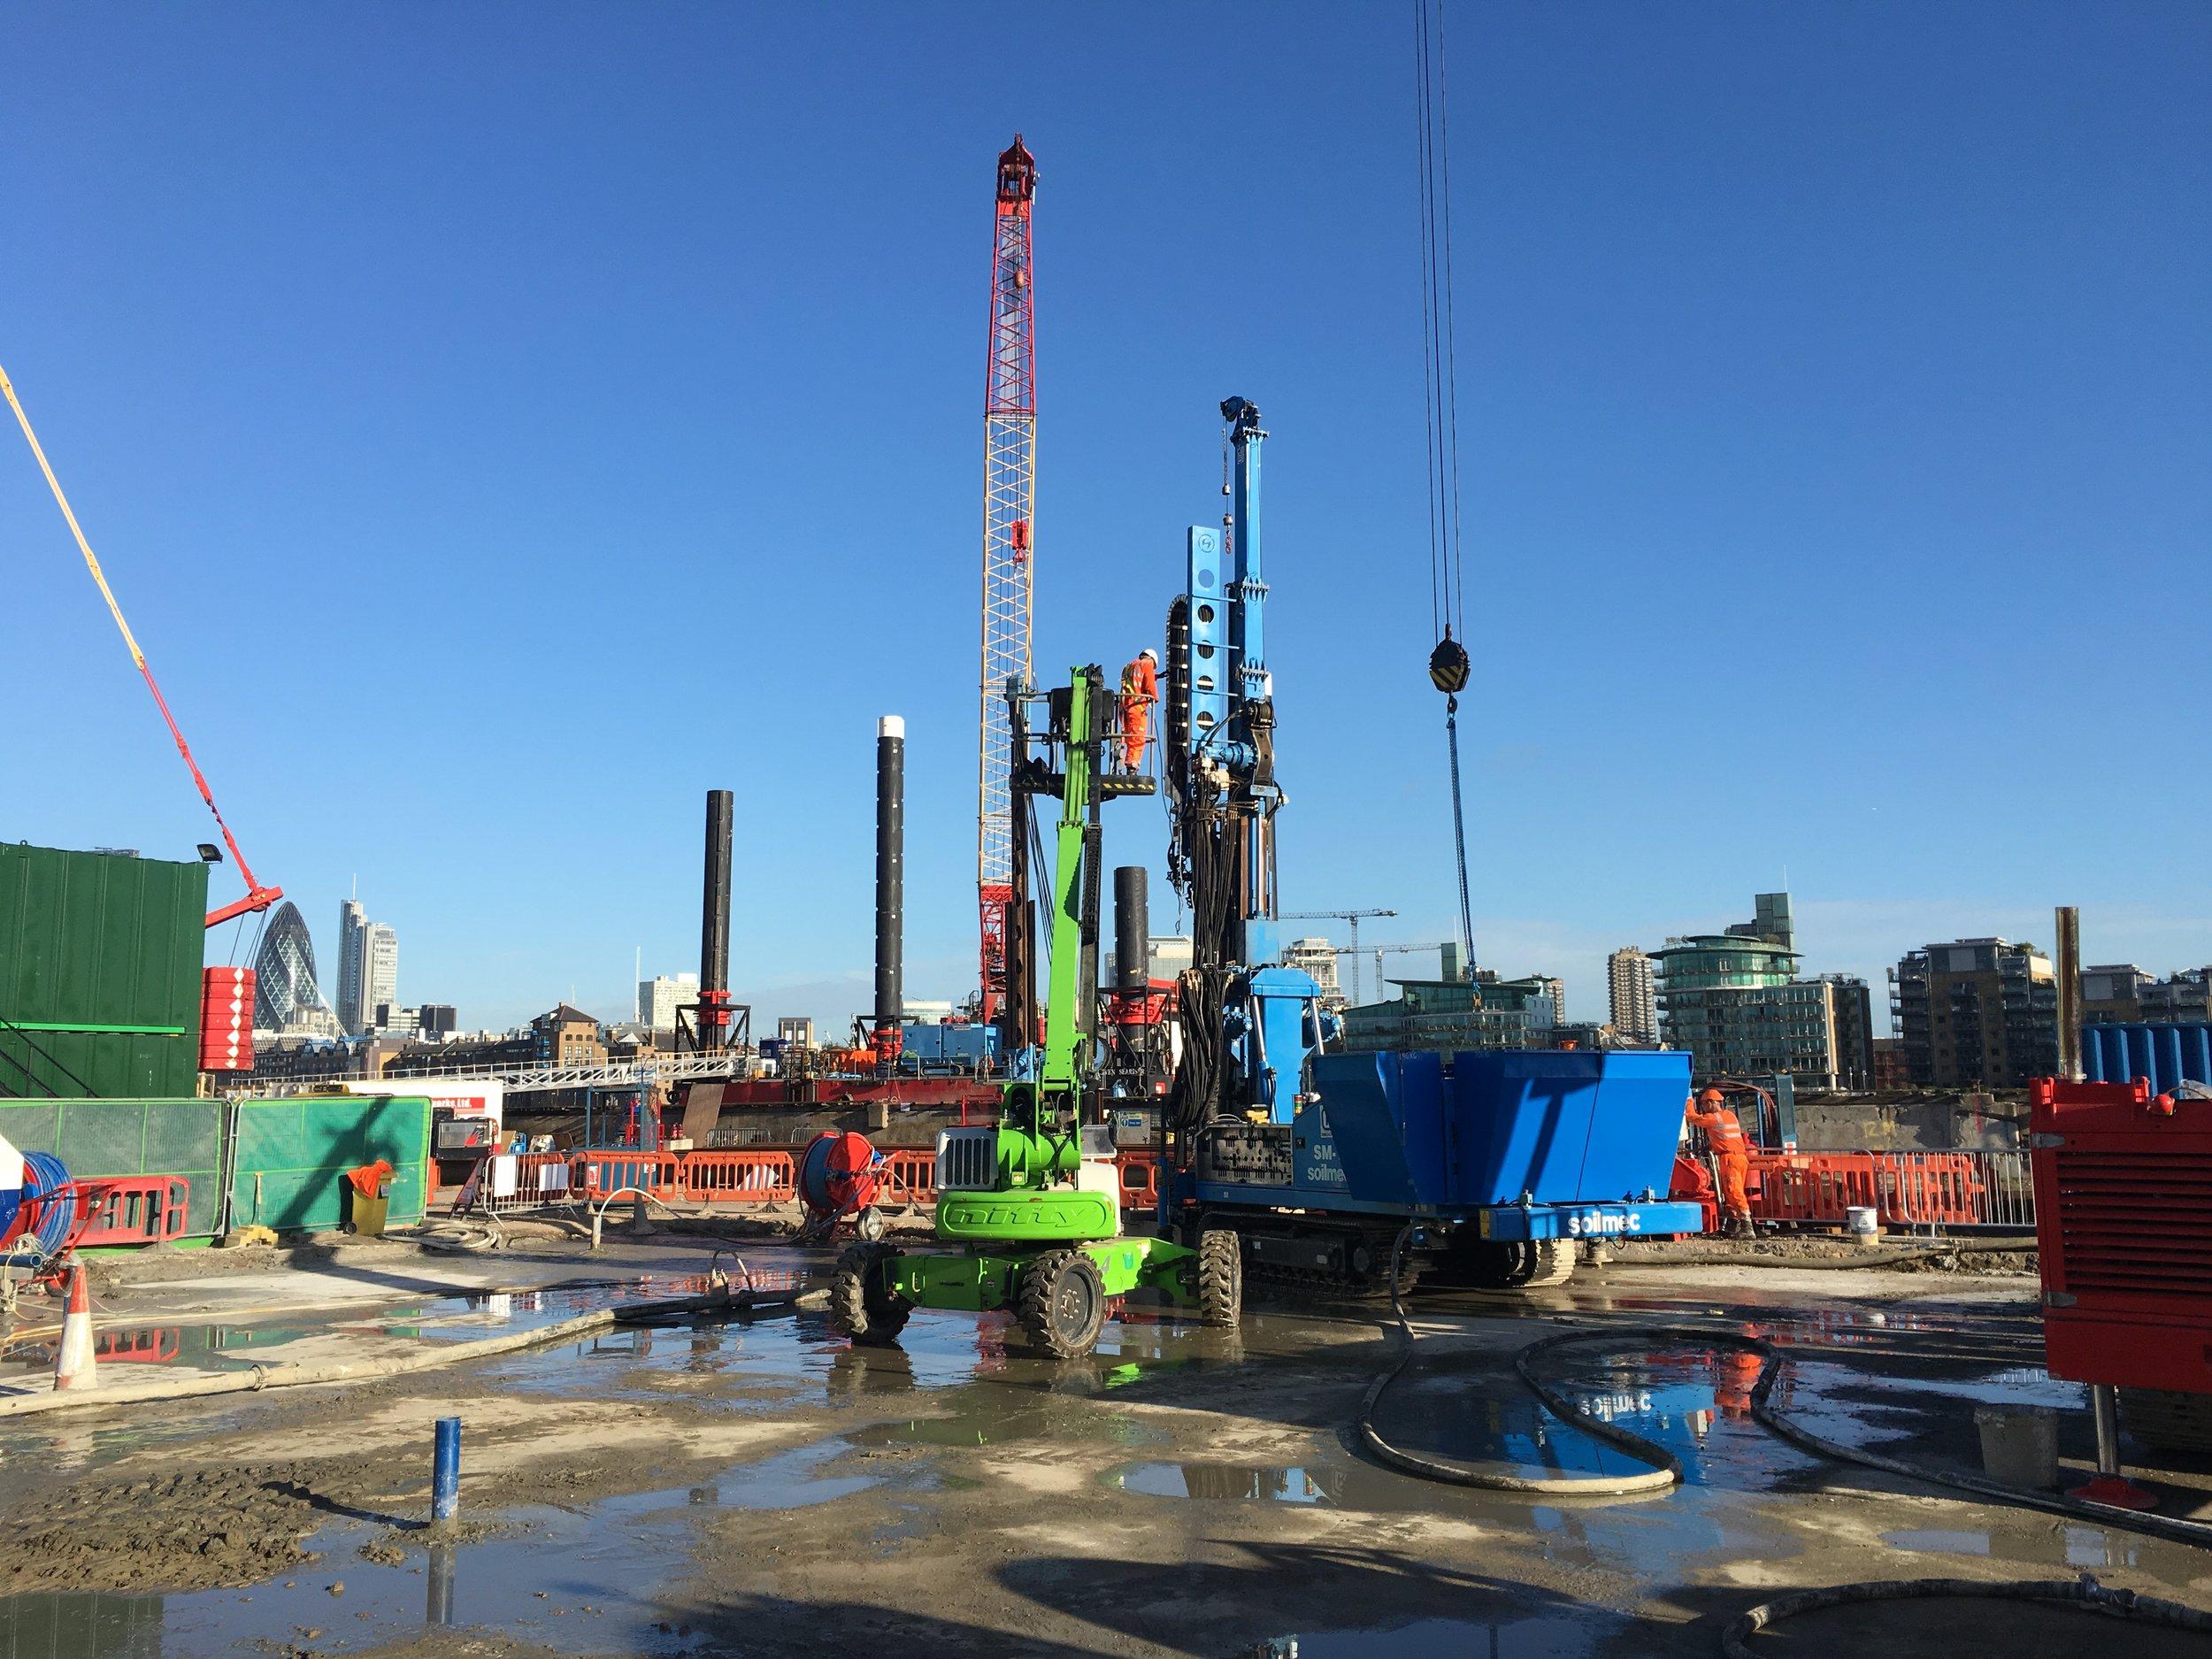 04_Construction_Equipment.JPG